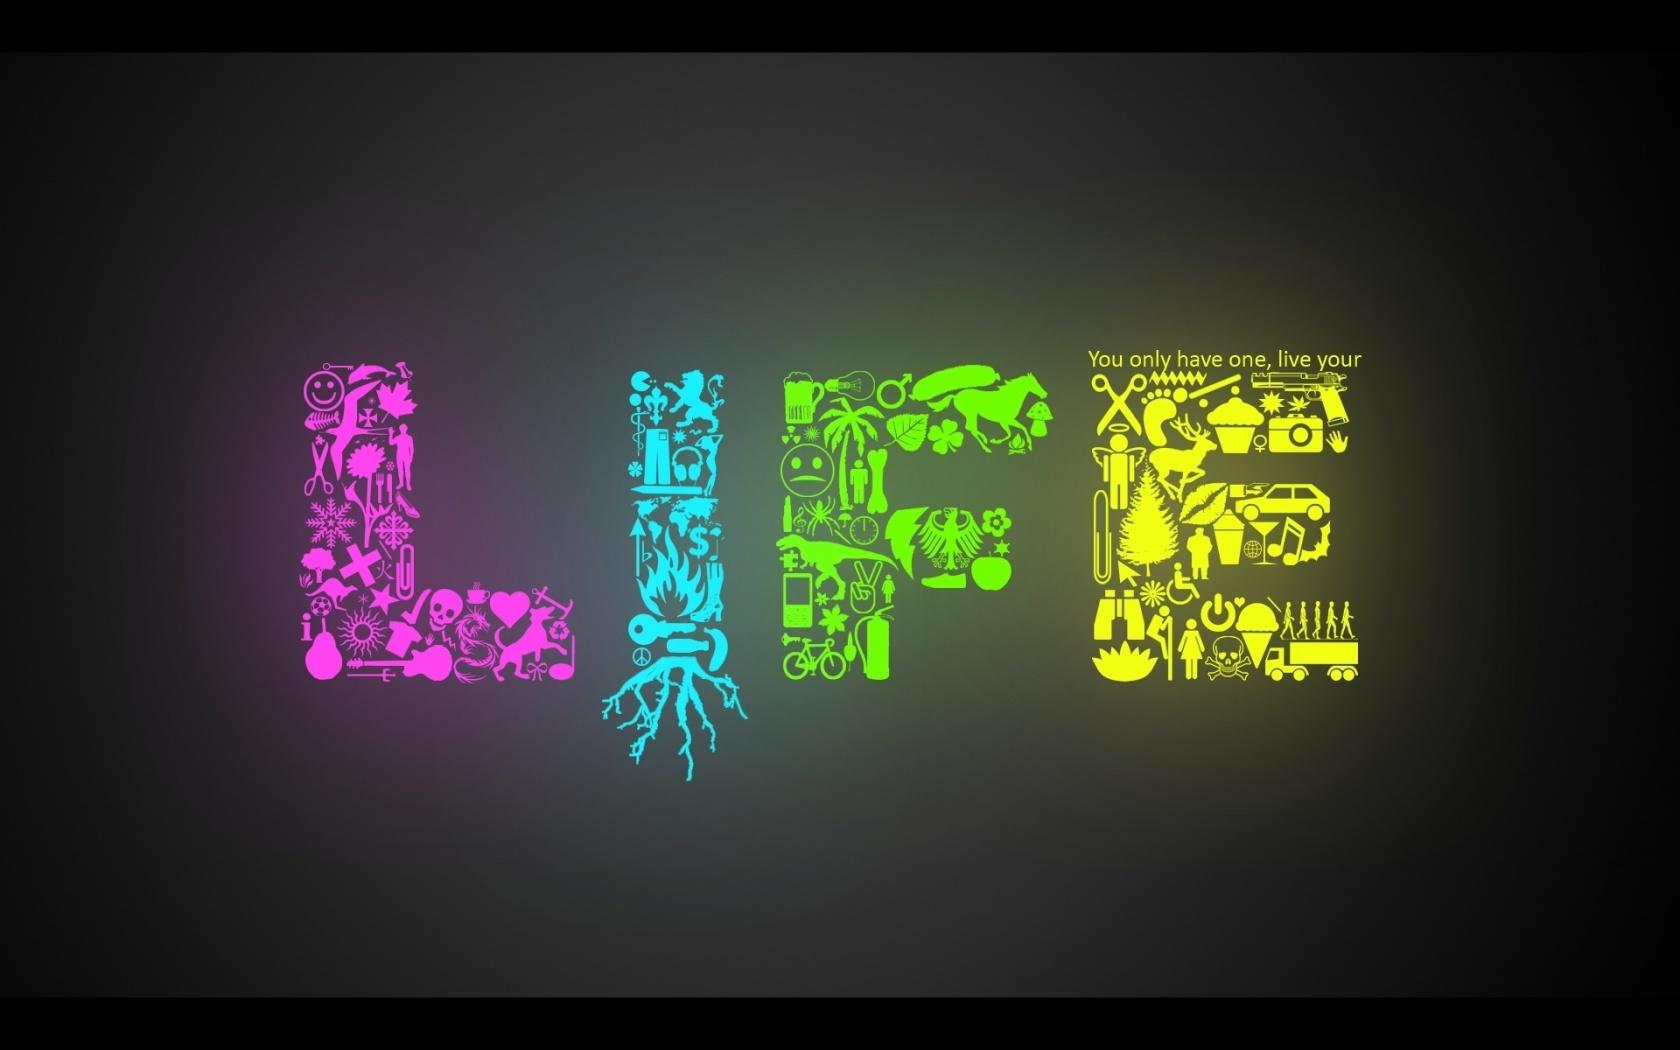 Description: Free download Life is good wallpaper desktop background ...